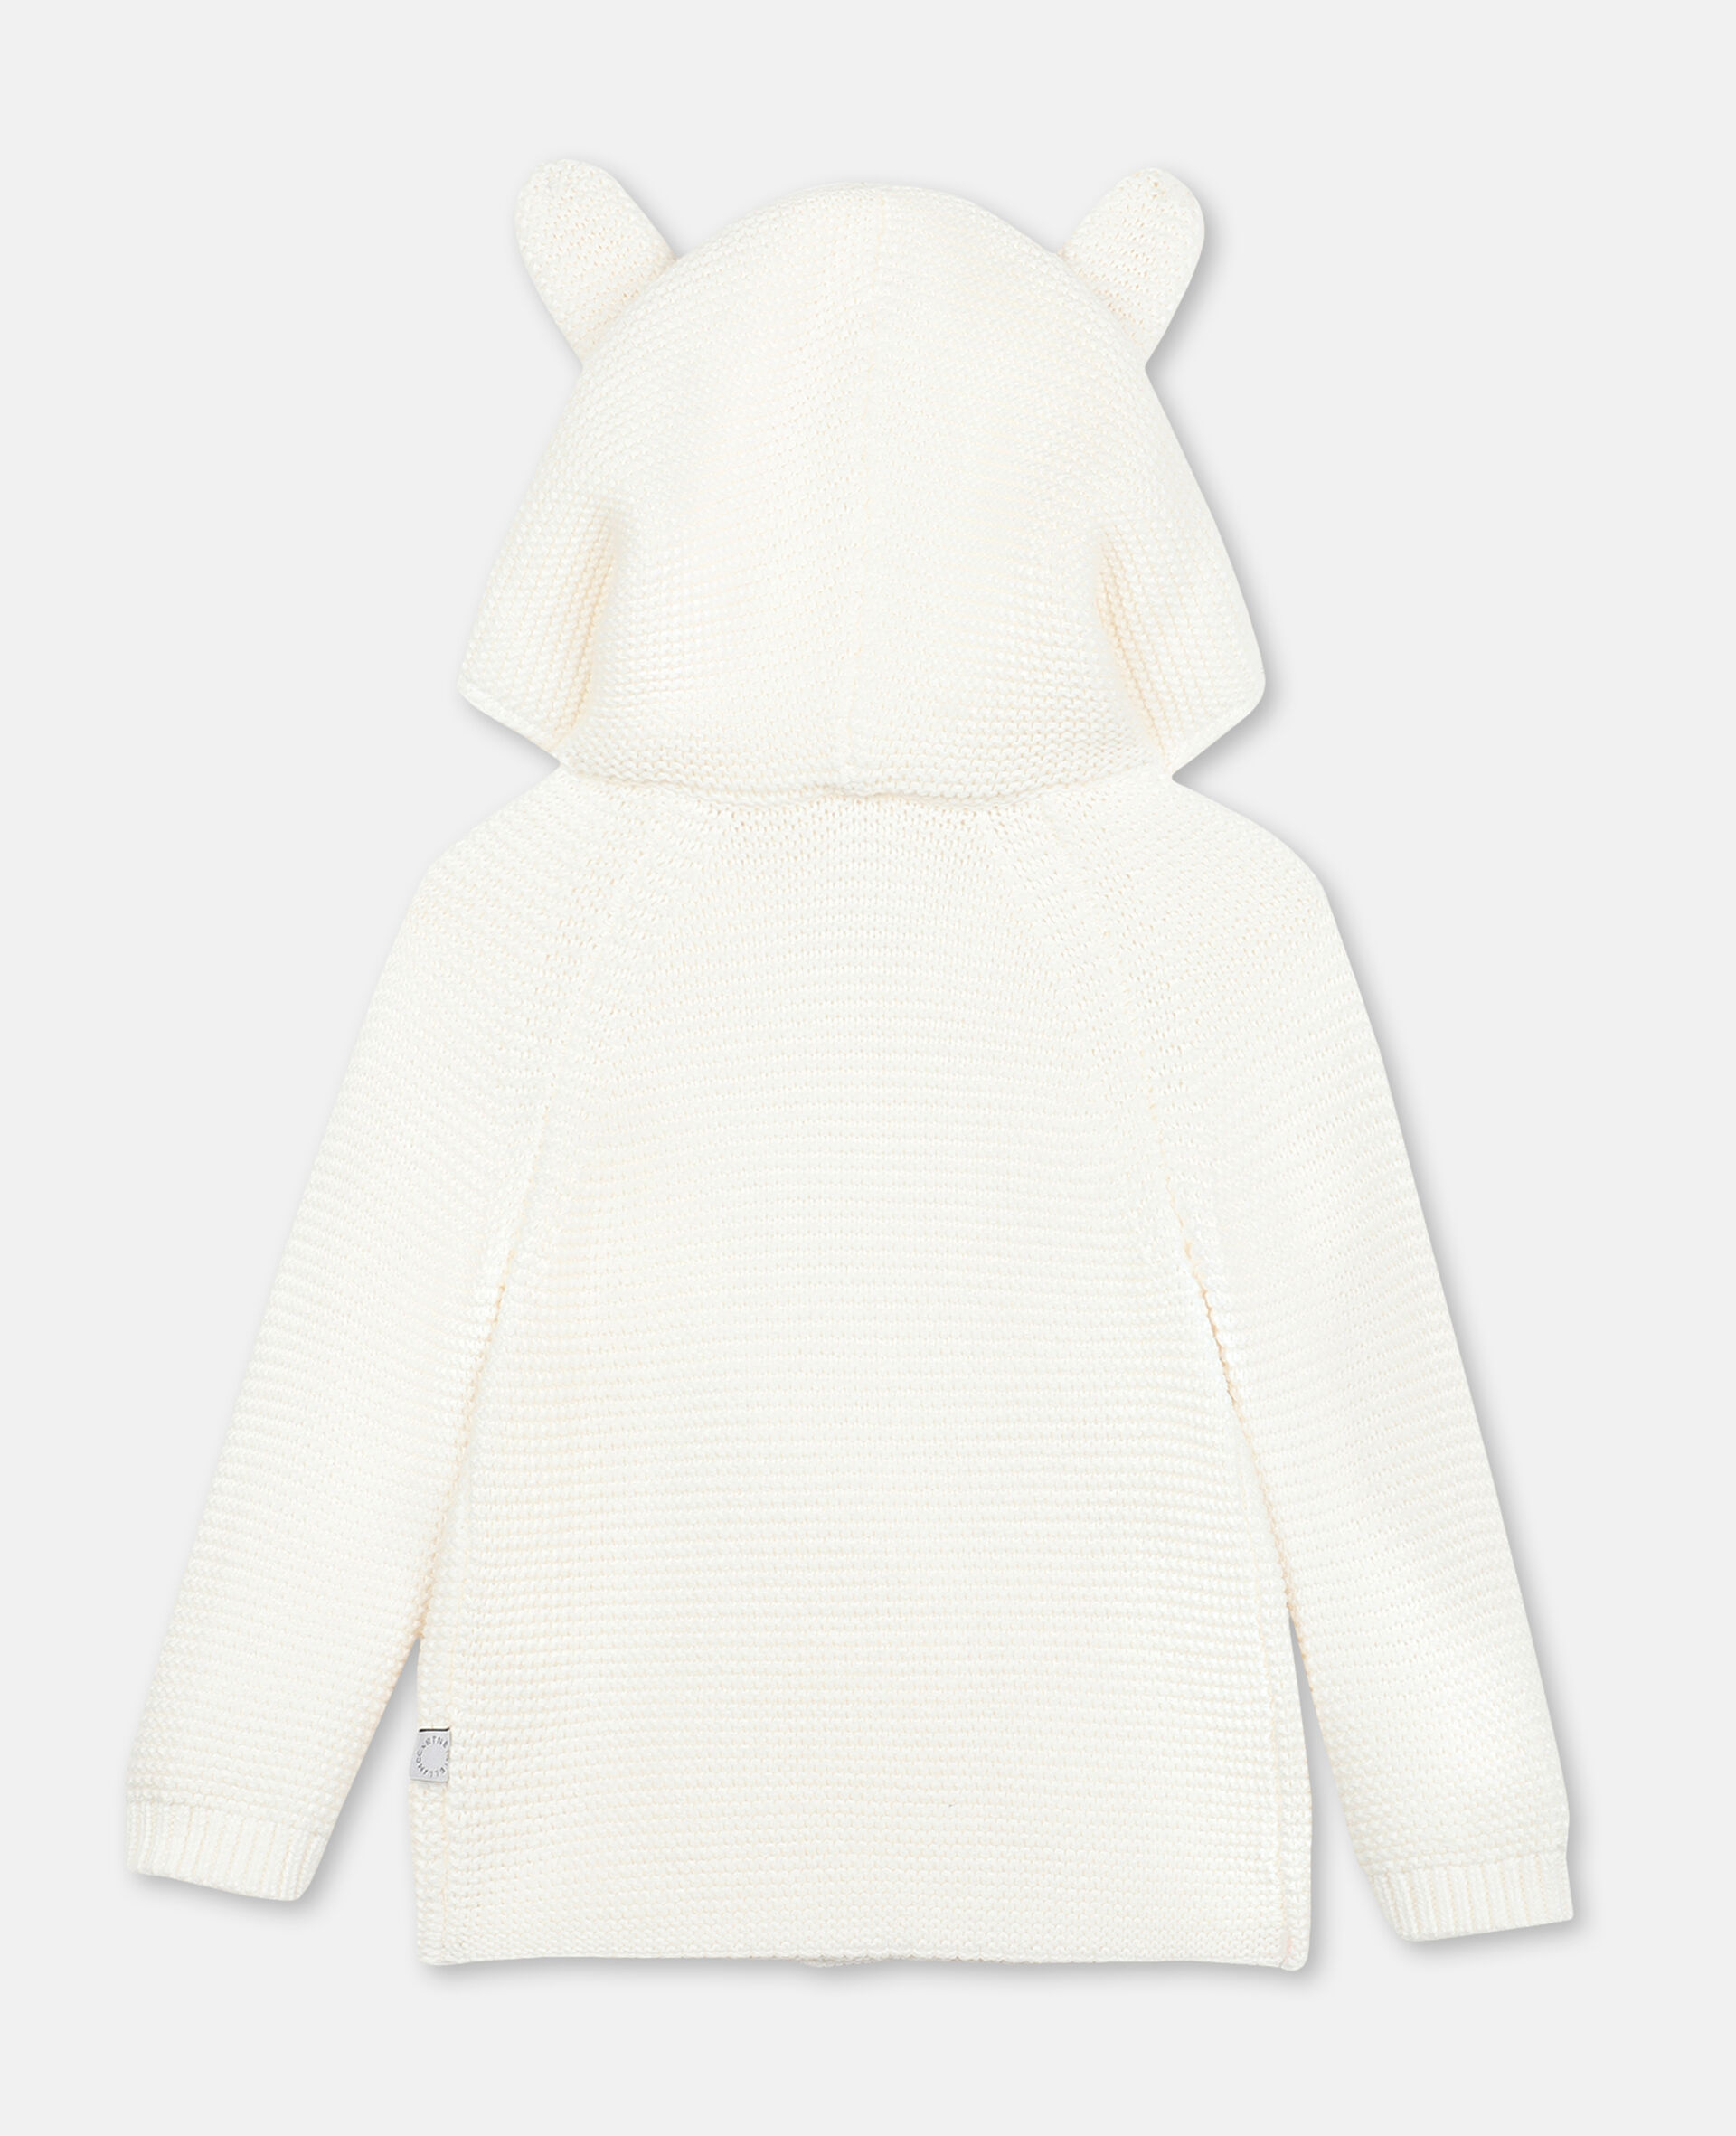 Bunny Knit Cardigan-White-large image number 3